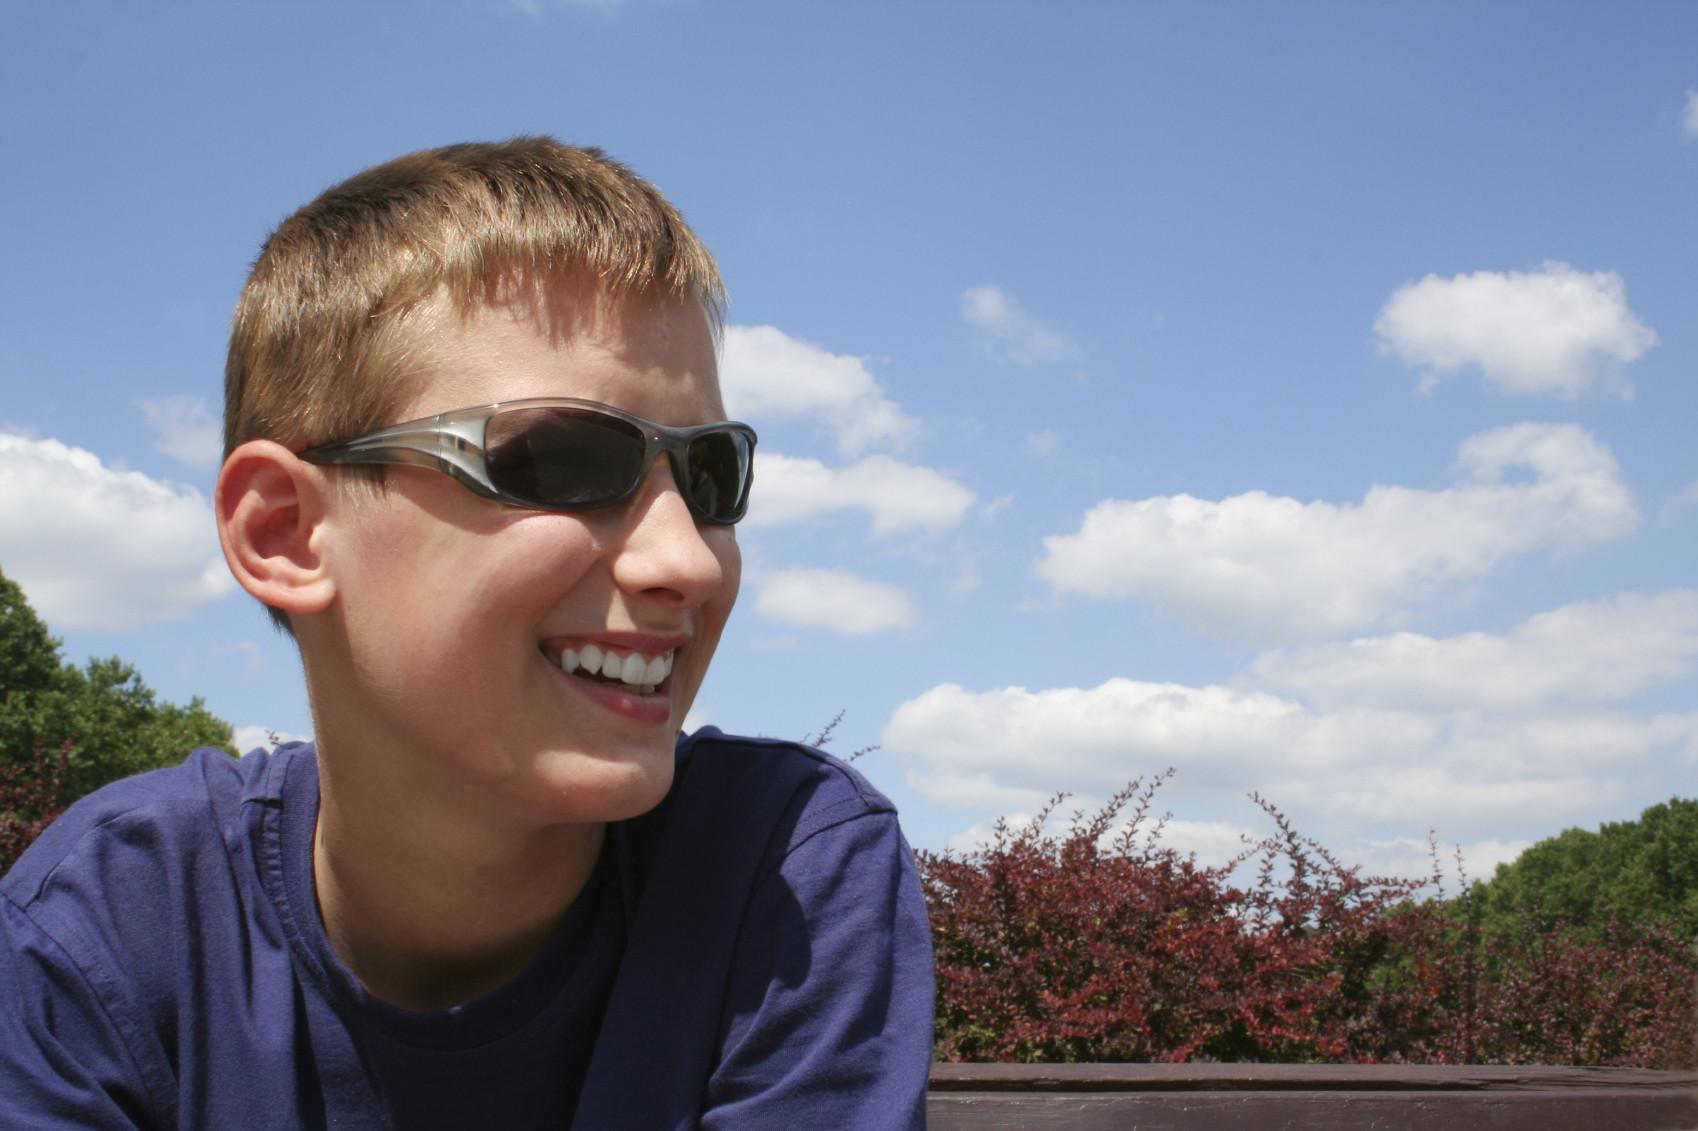 iStock-boy-sunglasses-eye-protection